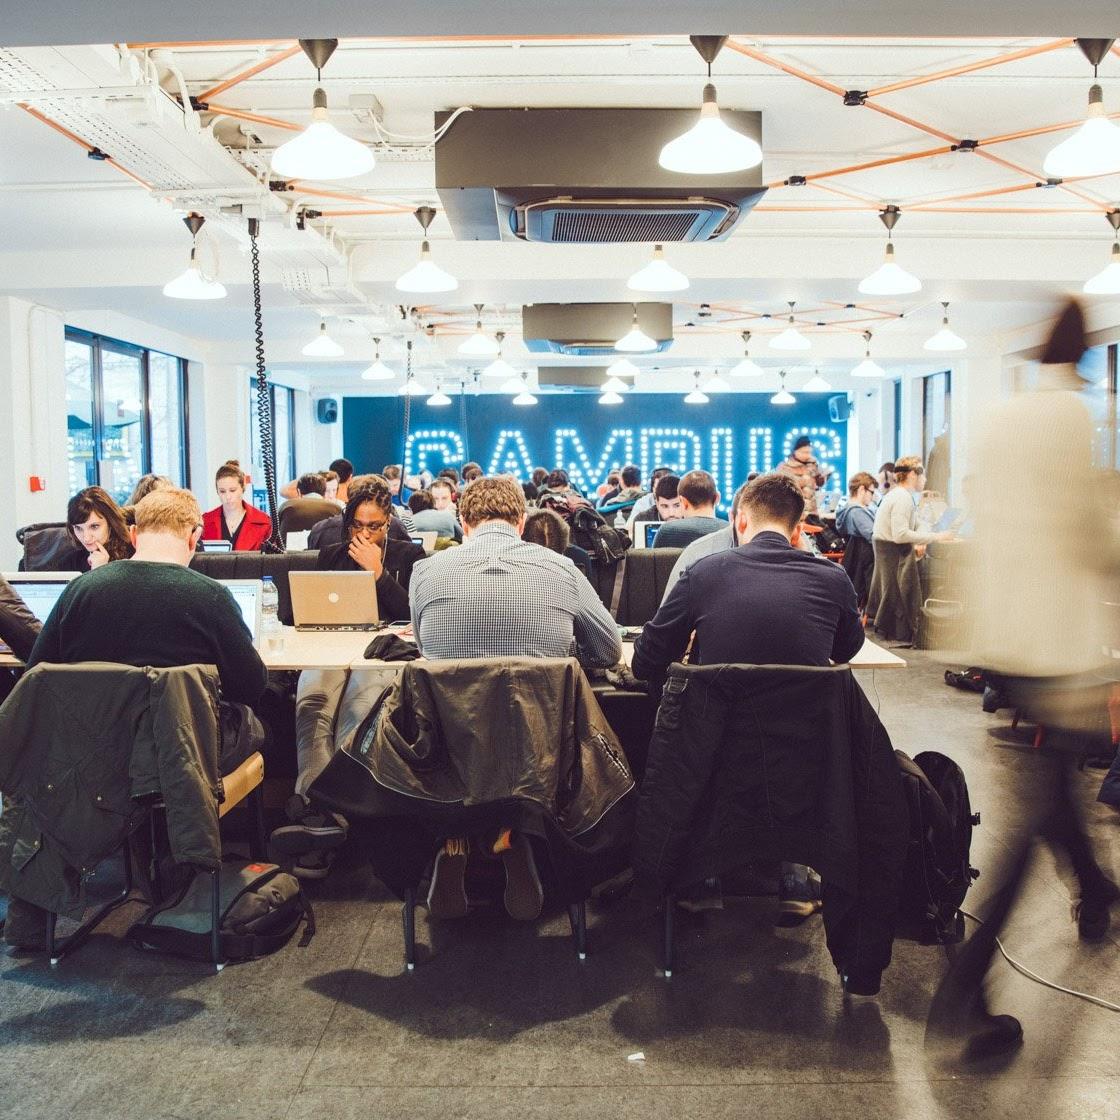 London Startup Cafe